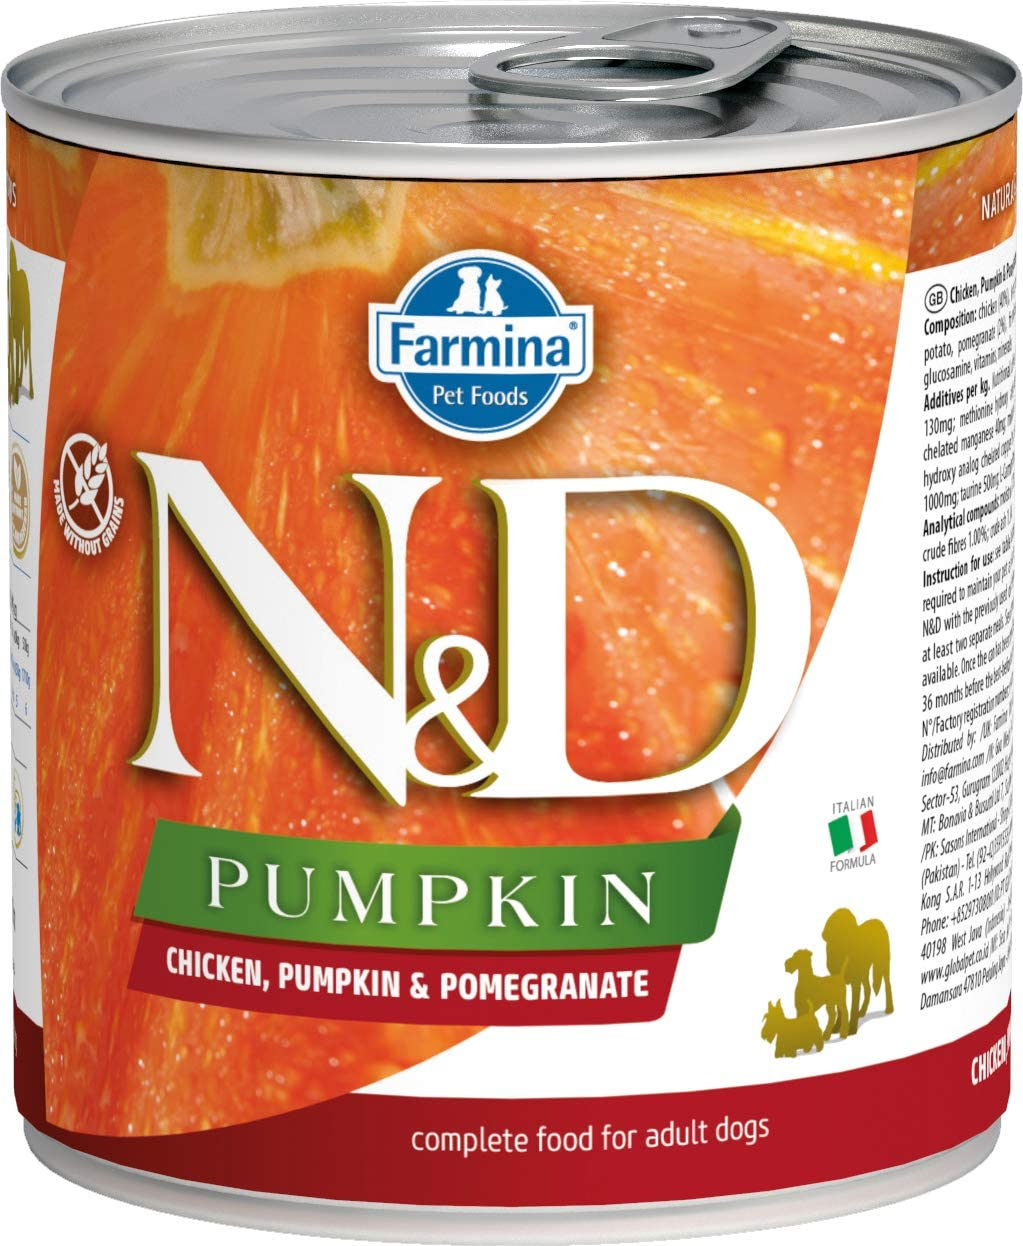 Farmina N&D Canine Pumpkin Chicken & Pomegranate 10 Ounces, Case of 6